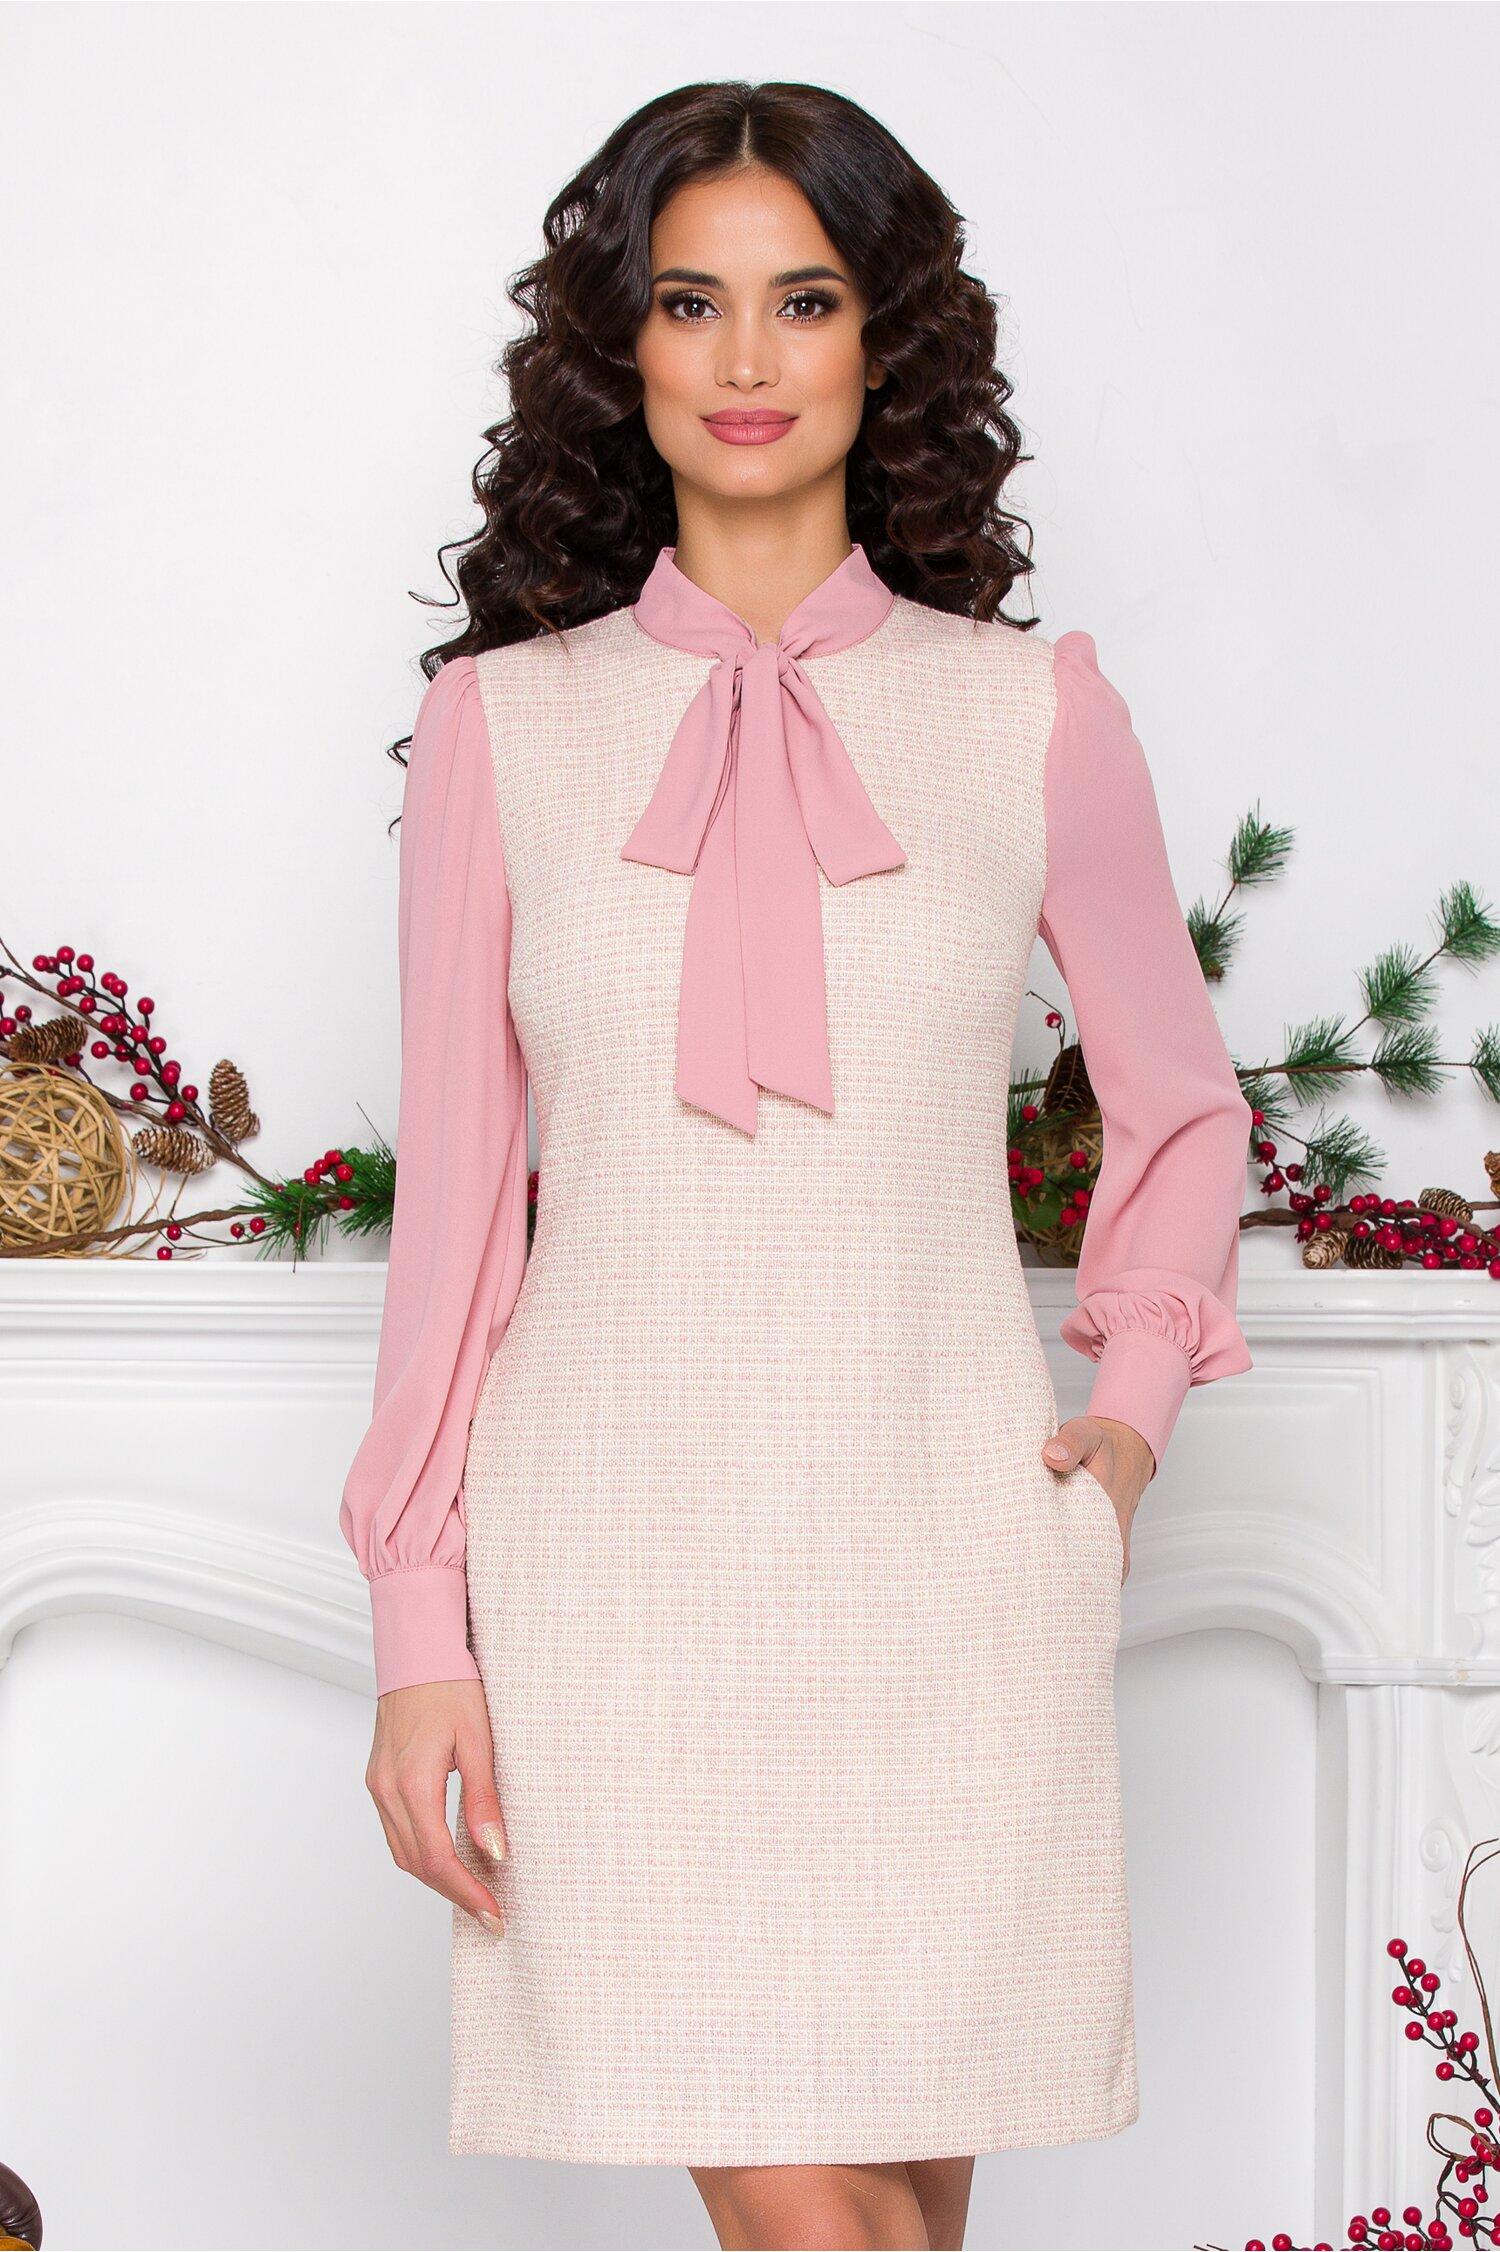 Rochie MBG din tricot ivory si maneci din voal roz cu funda la baza gatului